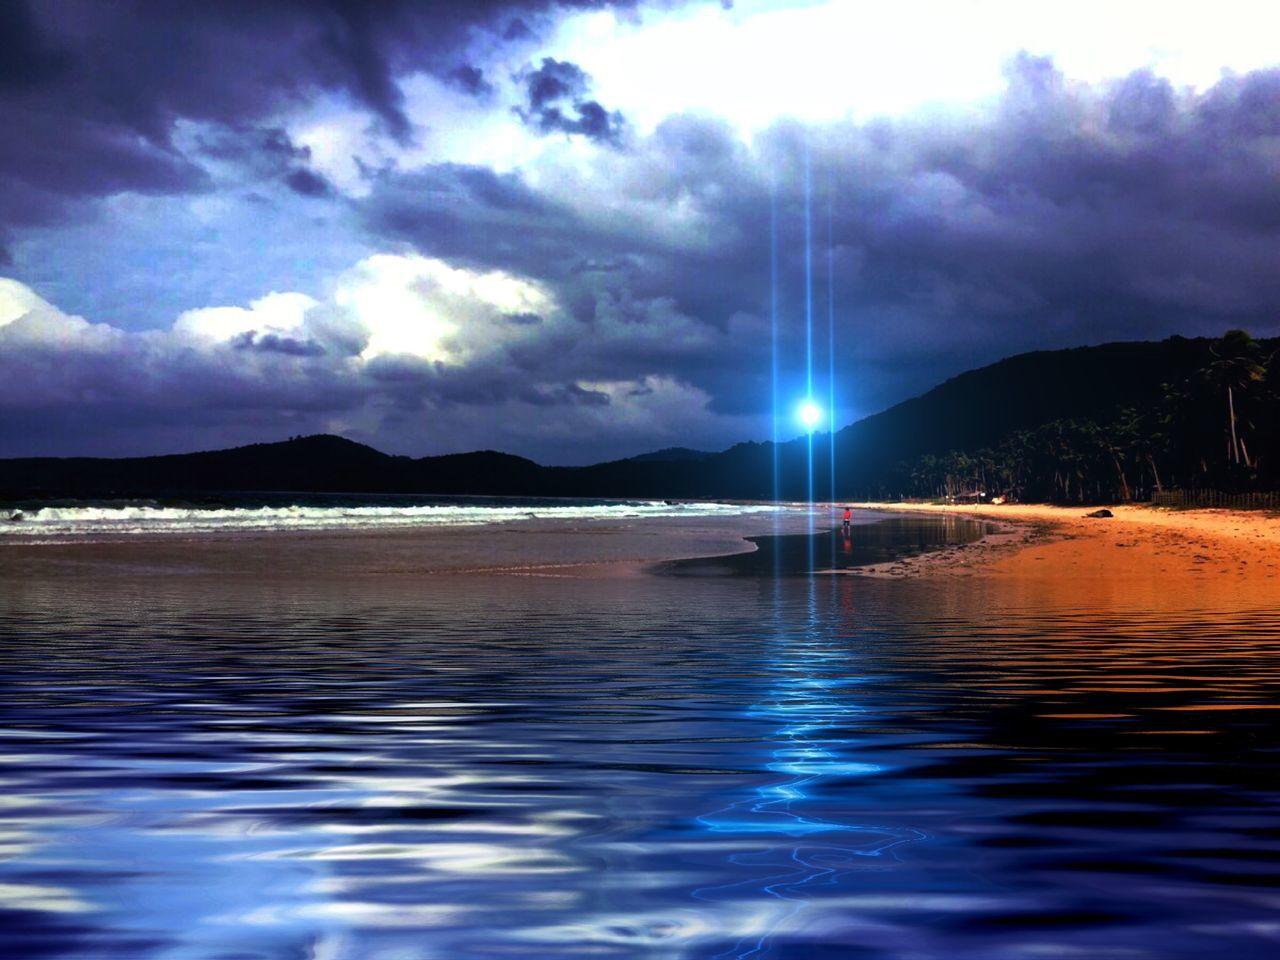 """My Version"" Nacpan Beach...a perfect beach scene!!! EyeEm Best Edits EyeEm Nature Lover Enjoying Life Malephotographerofthemonth Eyeem Philippines Eye4photography  Clouds And Sky Sea And Sky Beachphotography Beach"